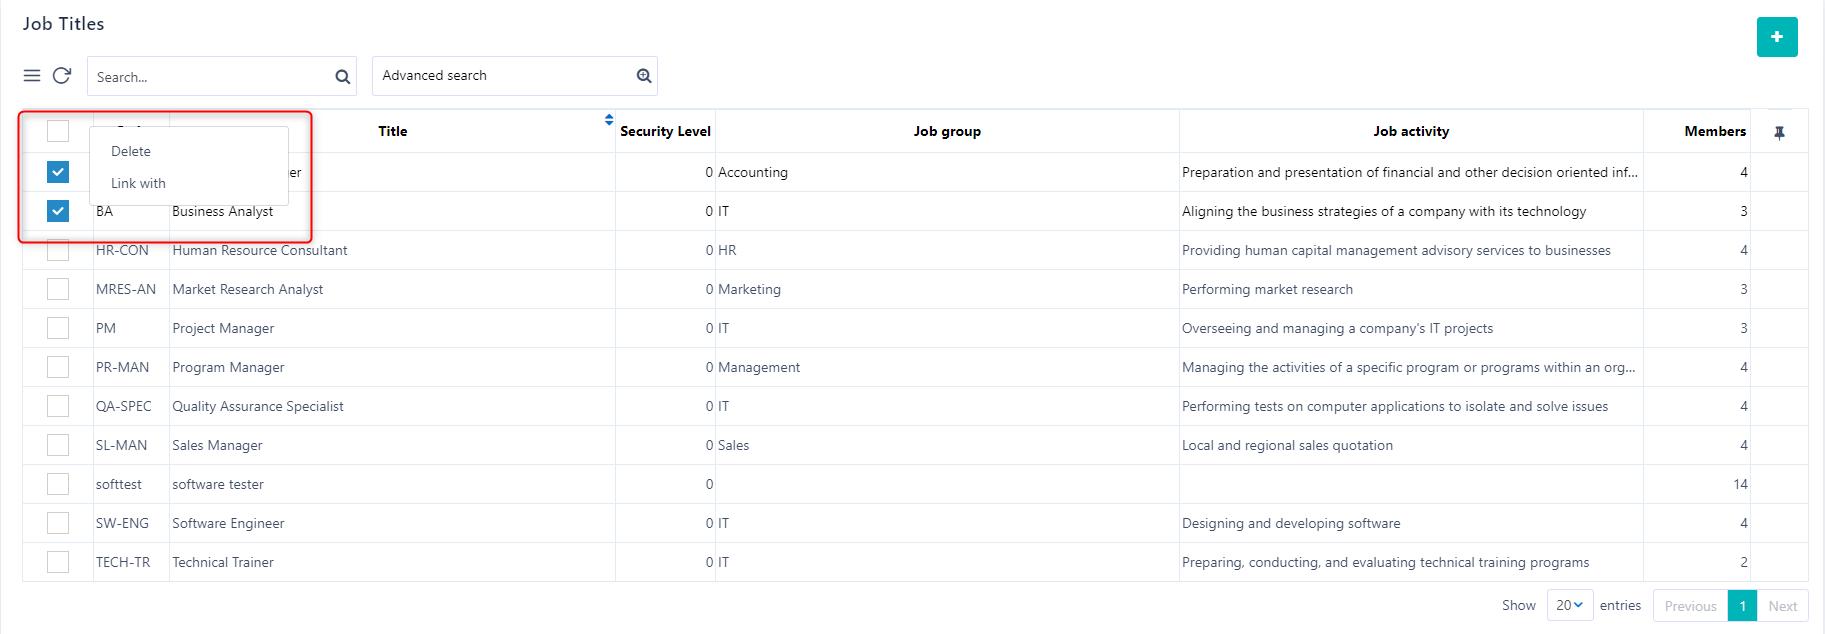 manage job titles v.6  Comidor Platform